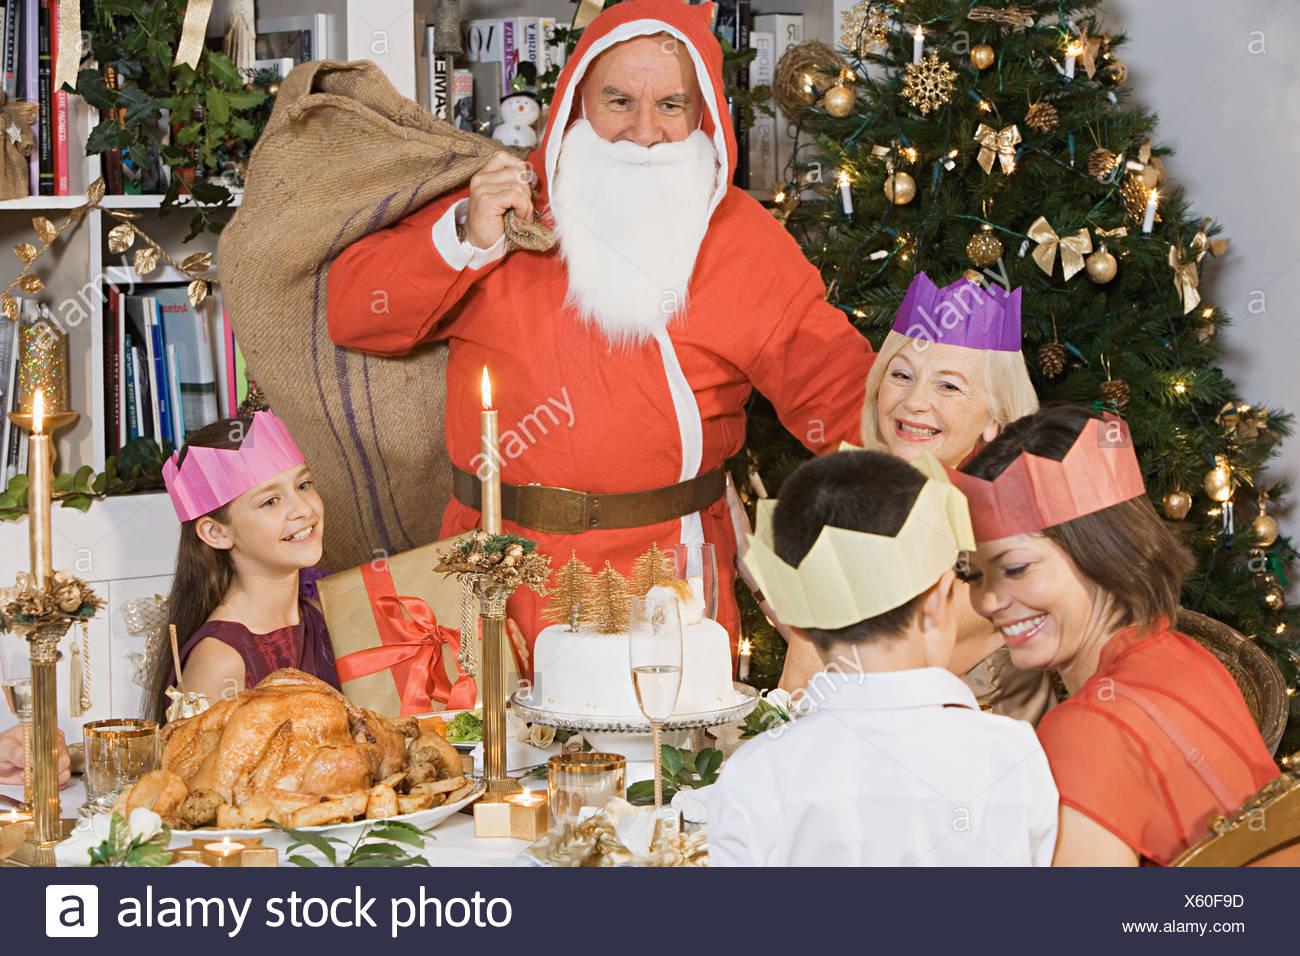 Santa claus at christmas dinner - Stock Image